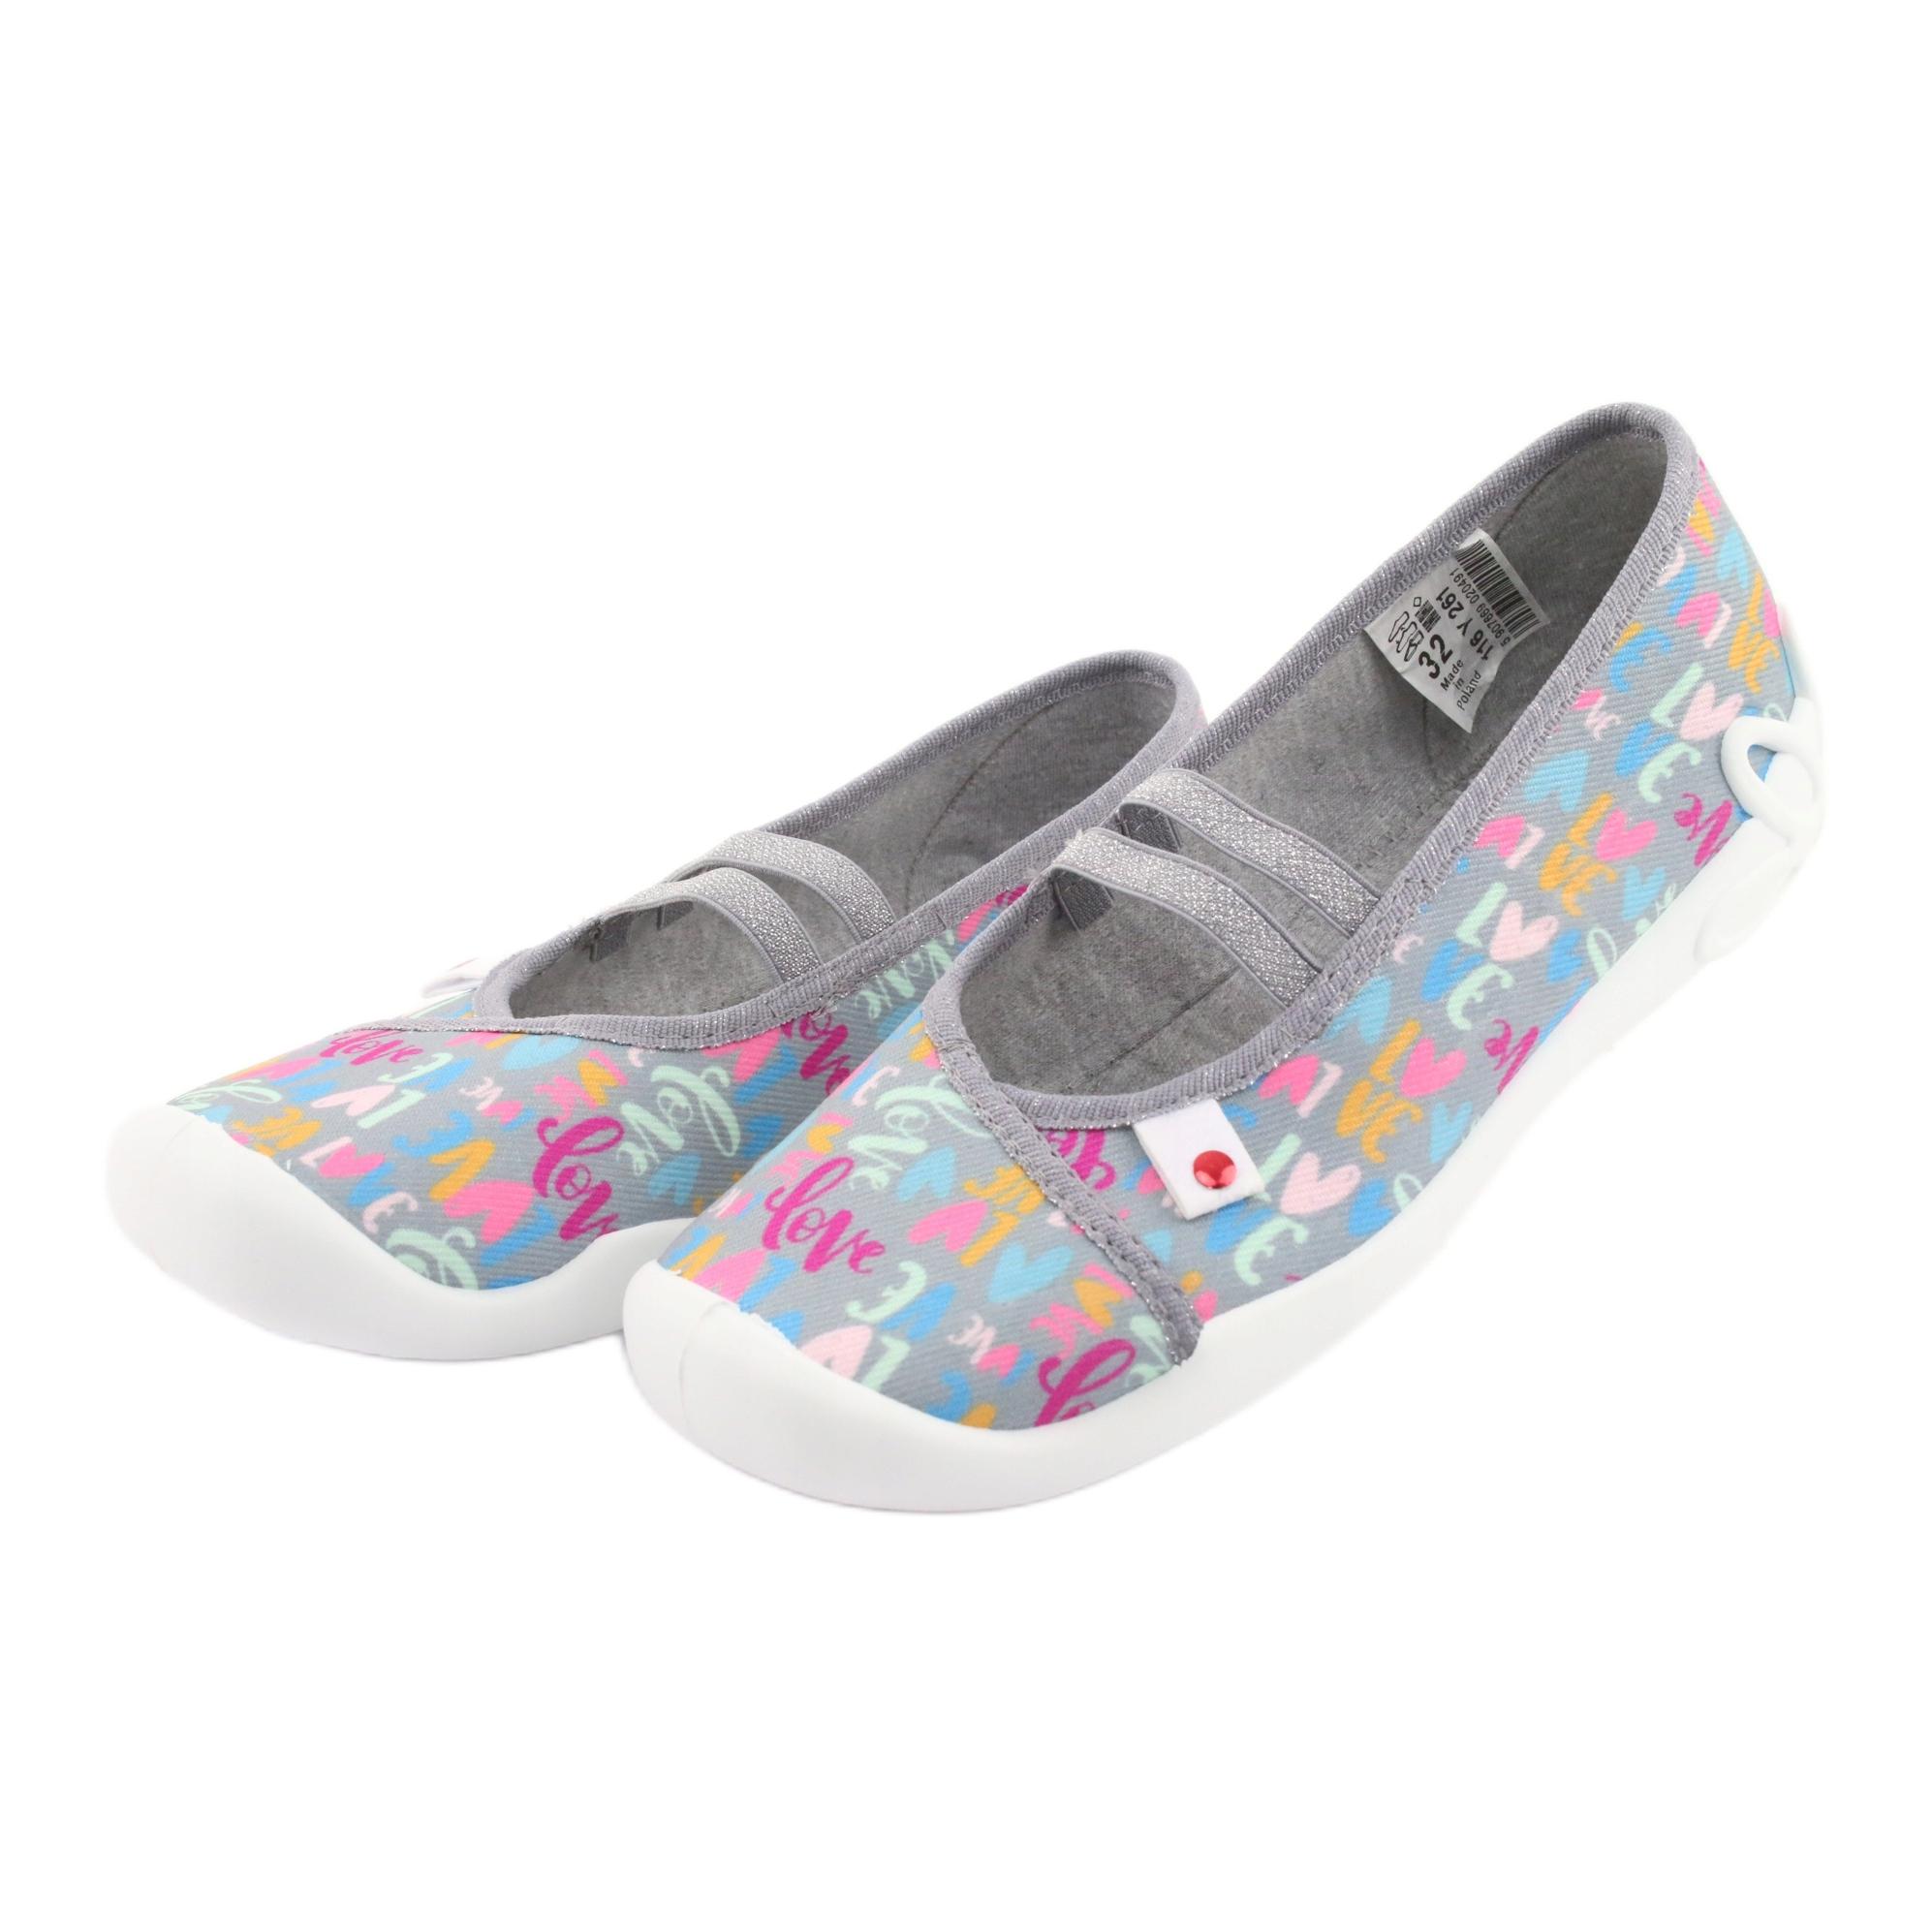 miniatura 4 - Scarpe per bambini Befado 116Y261 blu rosa grigio verde giallo